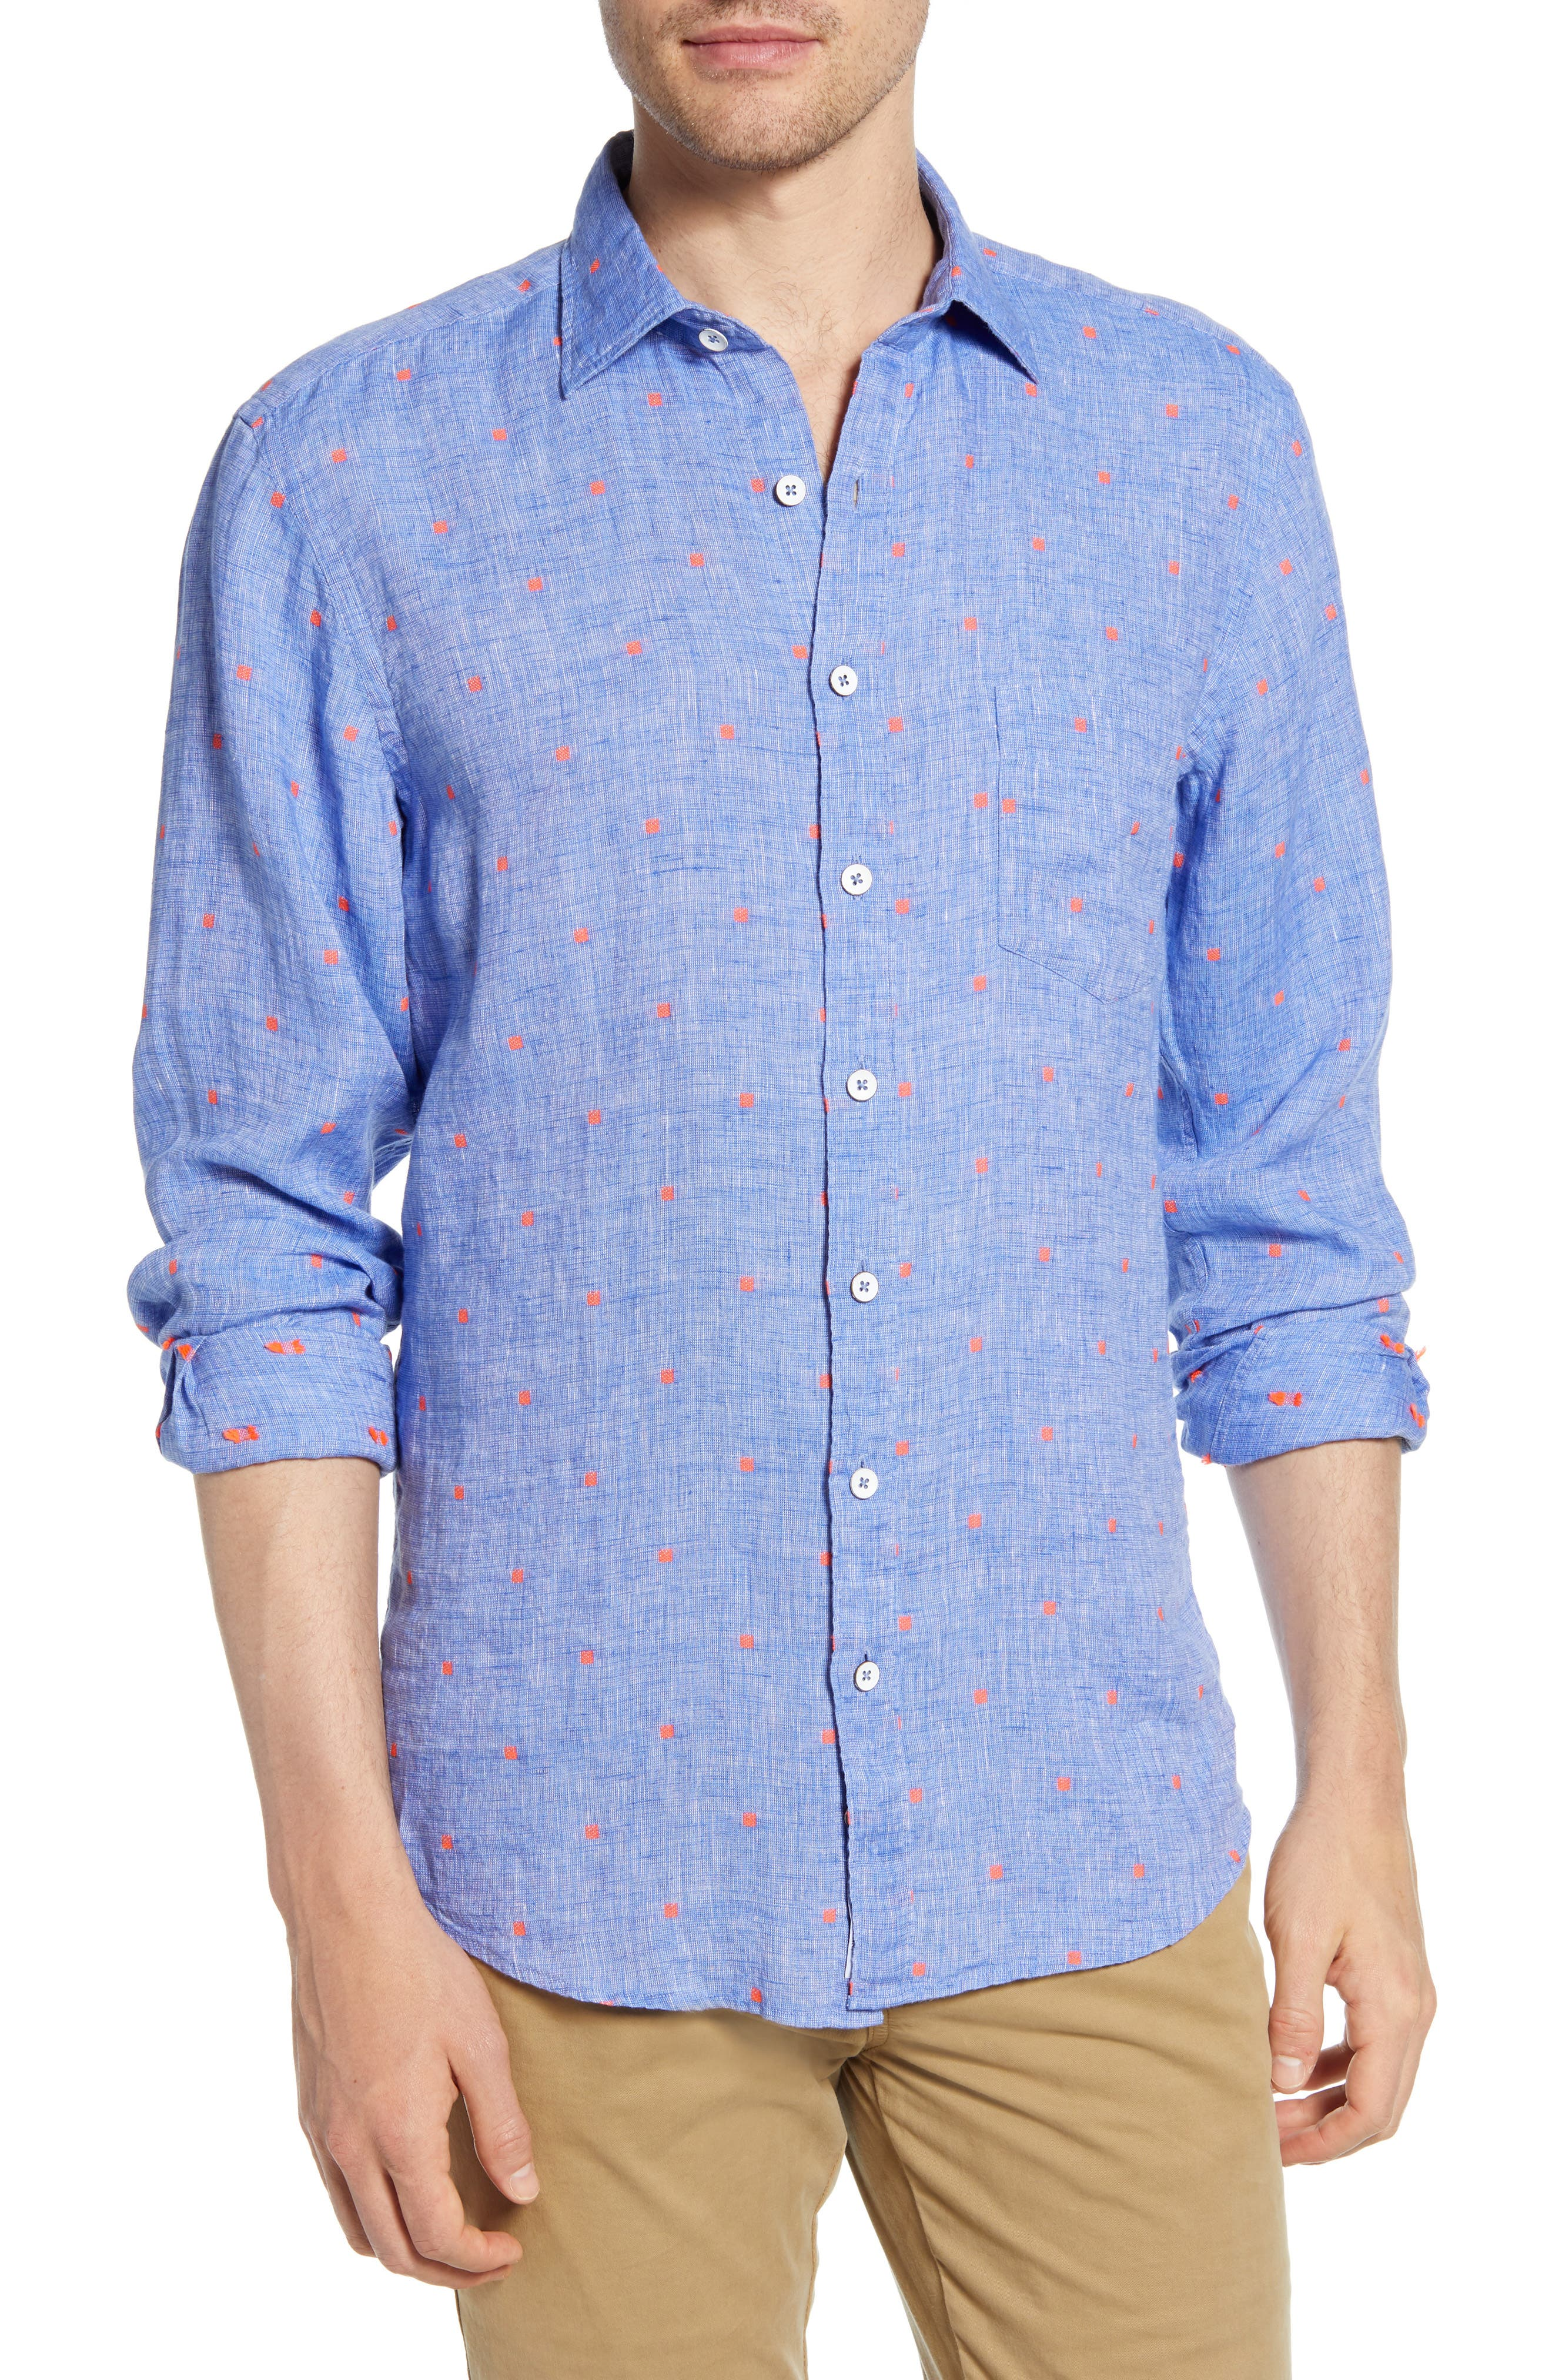 Image of RODD AND GUNN Fox Street Regular Fit Shirt